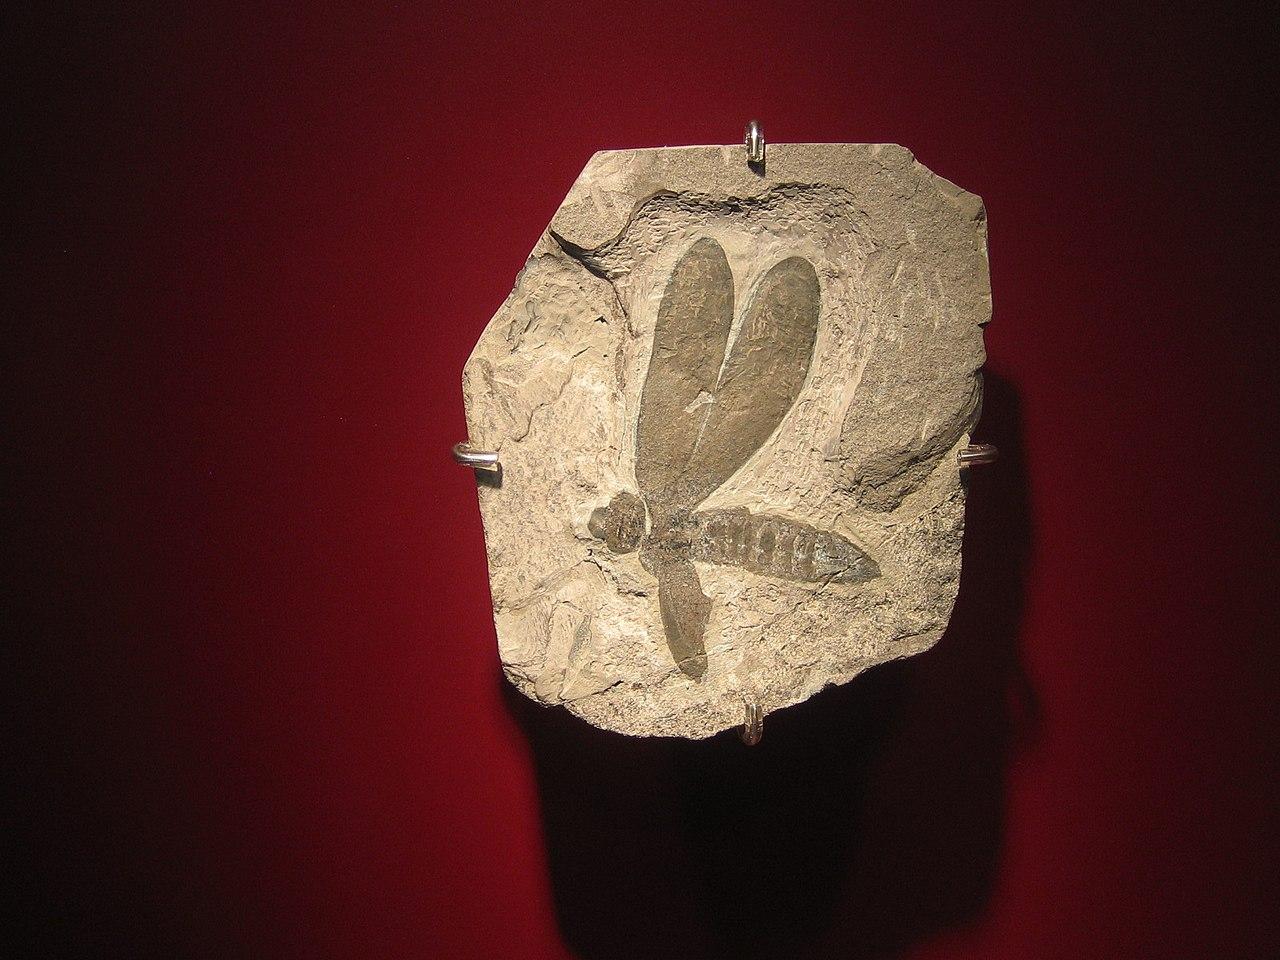 Fosili 1280px-Caloneura_dowsoni